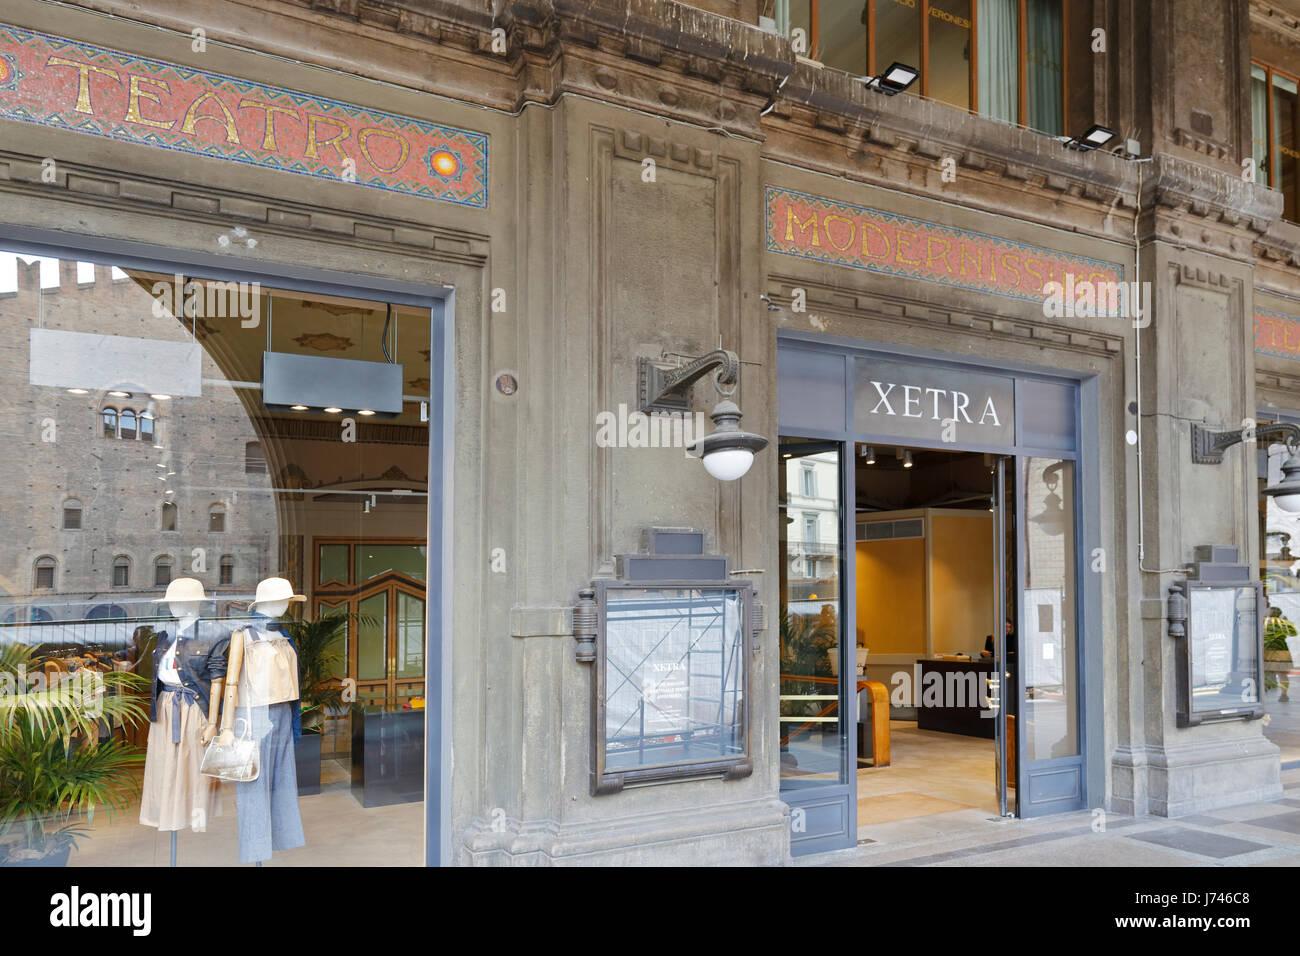 Xetra Italian clothing store in the renovated Teatro Modernissimo, Piazza Re Enzo, Bologna, Emilia-Romagna, Italy, Stock Photo